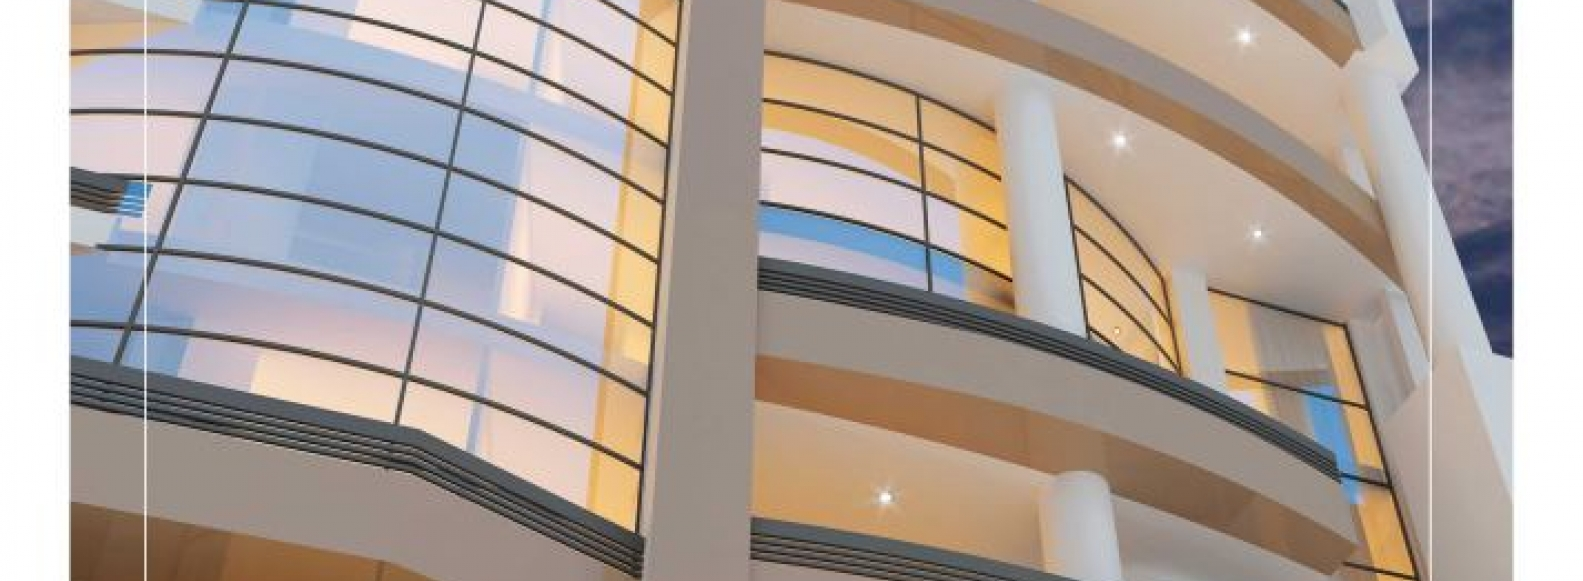 RAZ OFFICE BUILDING